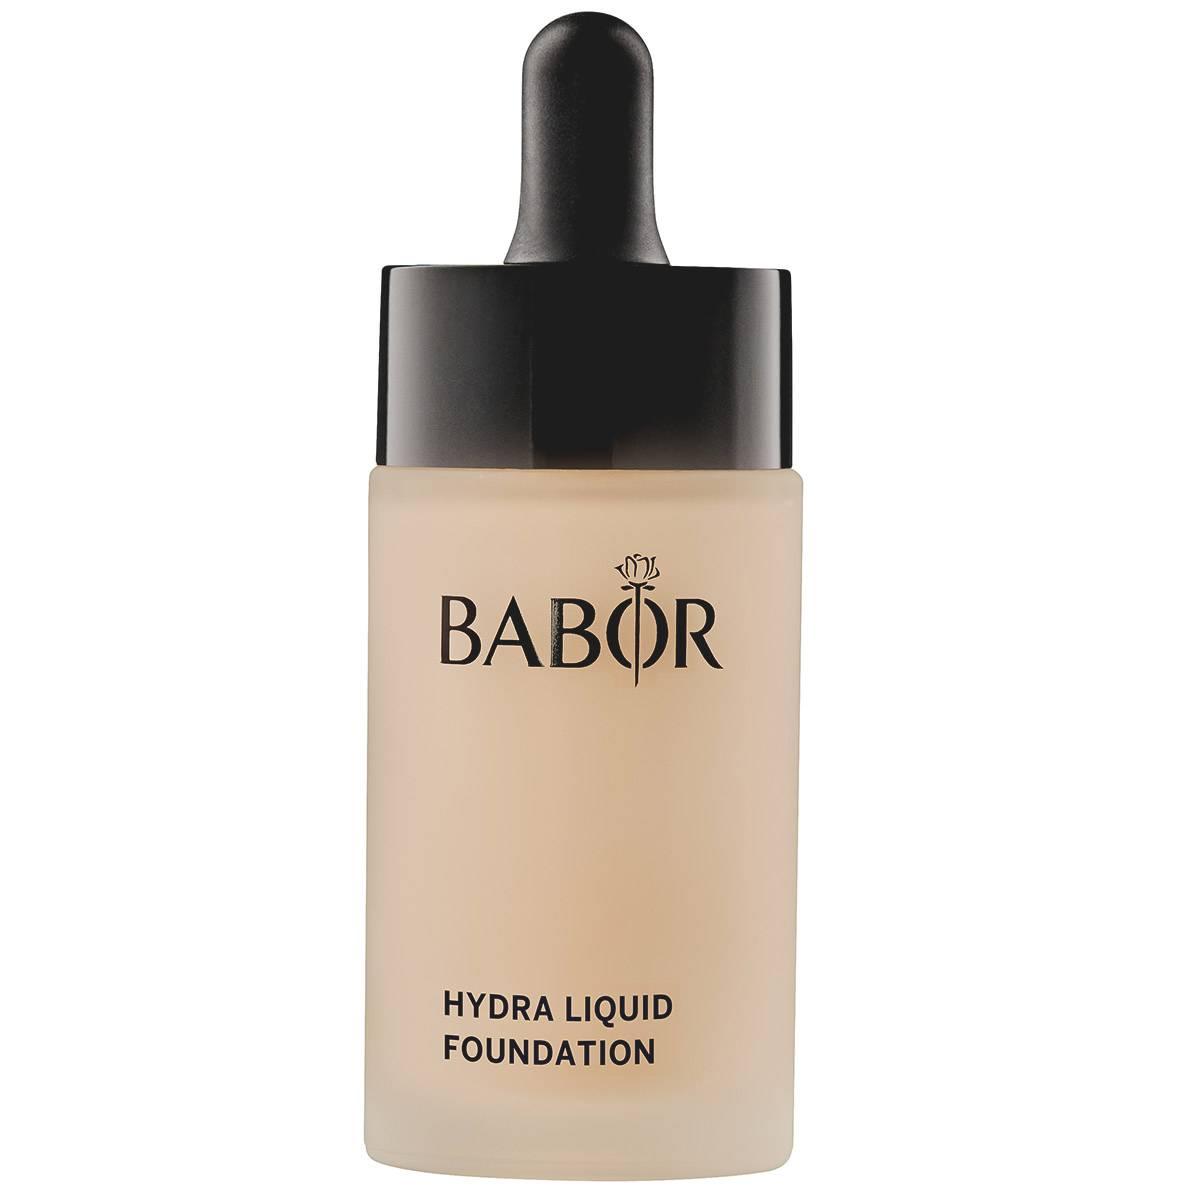 Babor Hydra Liquid Foundation 08 Sunny 30ml